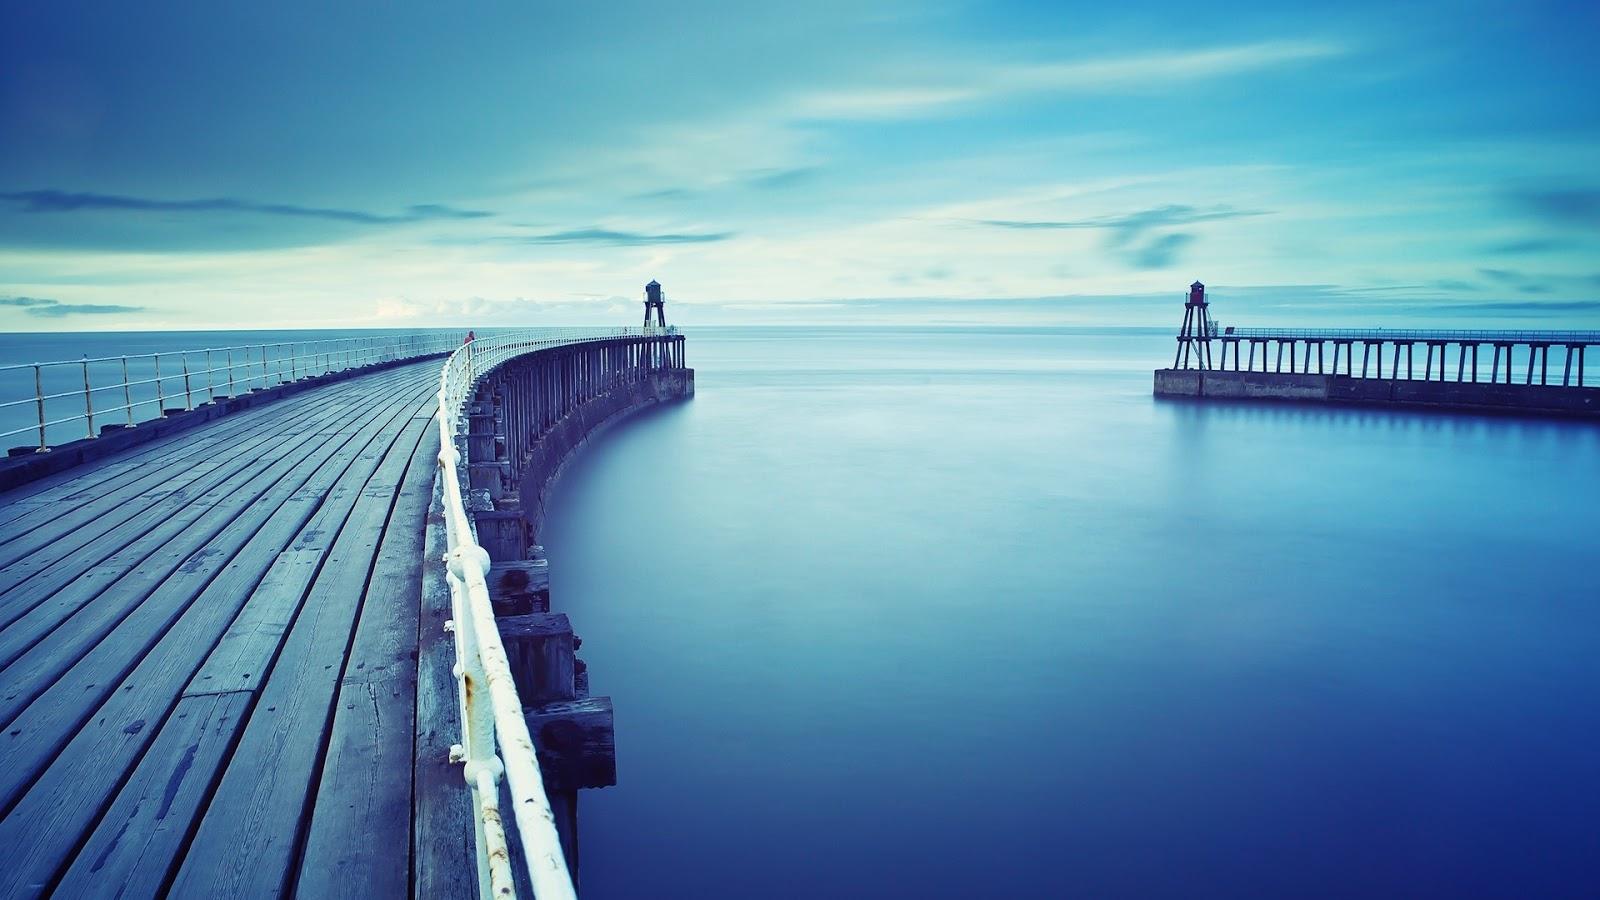 Blue Docks